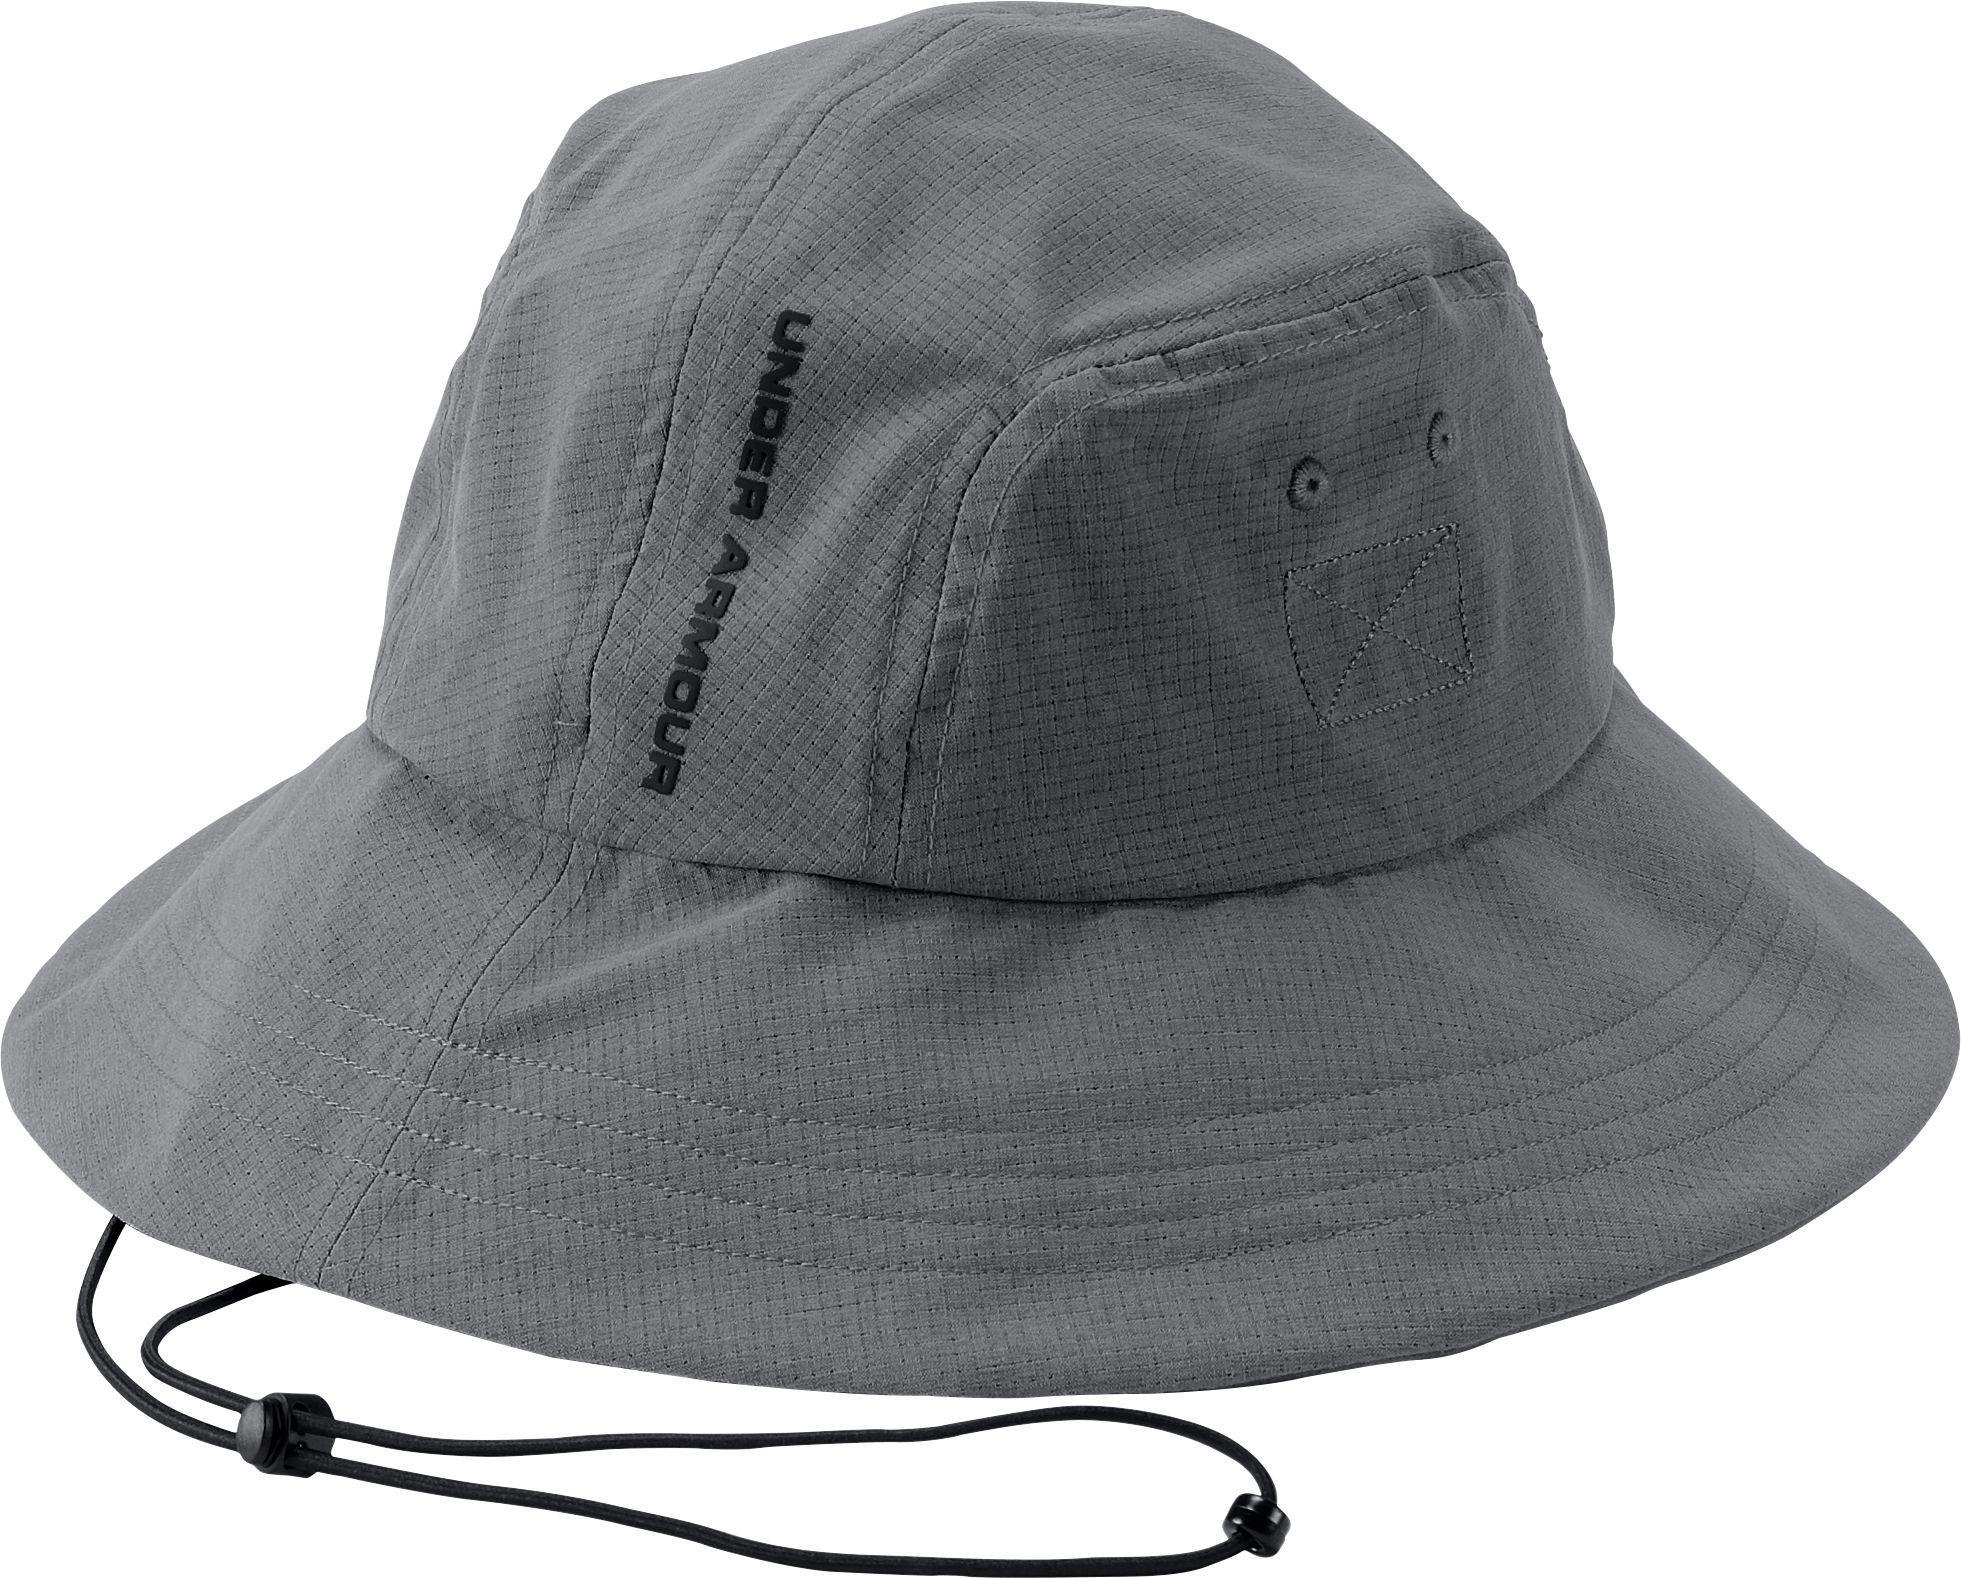 4083039887909 Lyst - Under Armour Armourvent Warrior 2.0 Bucket Hat in Black for Men